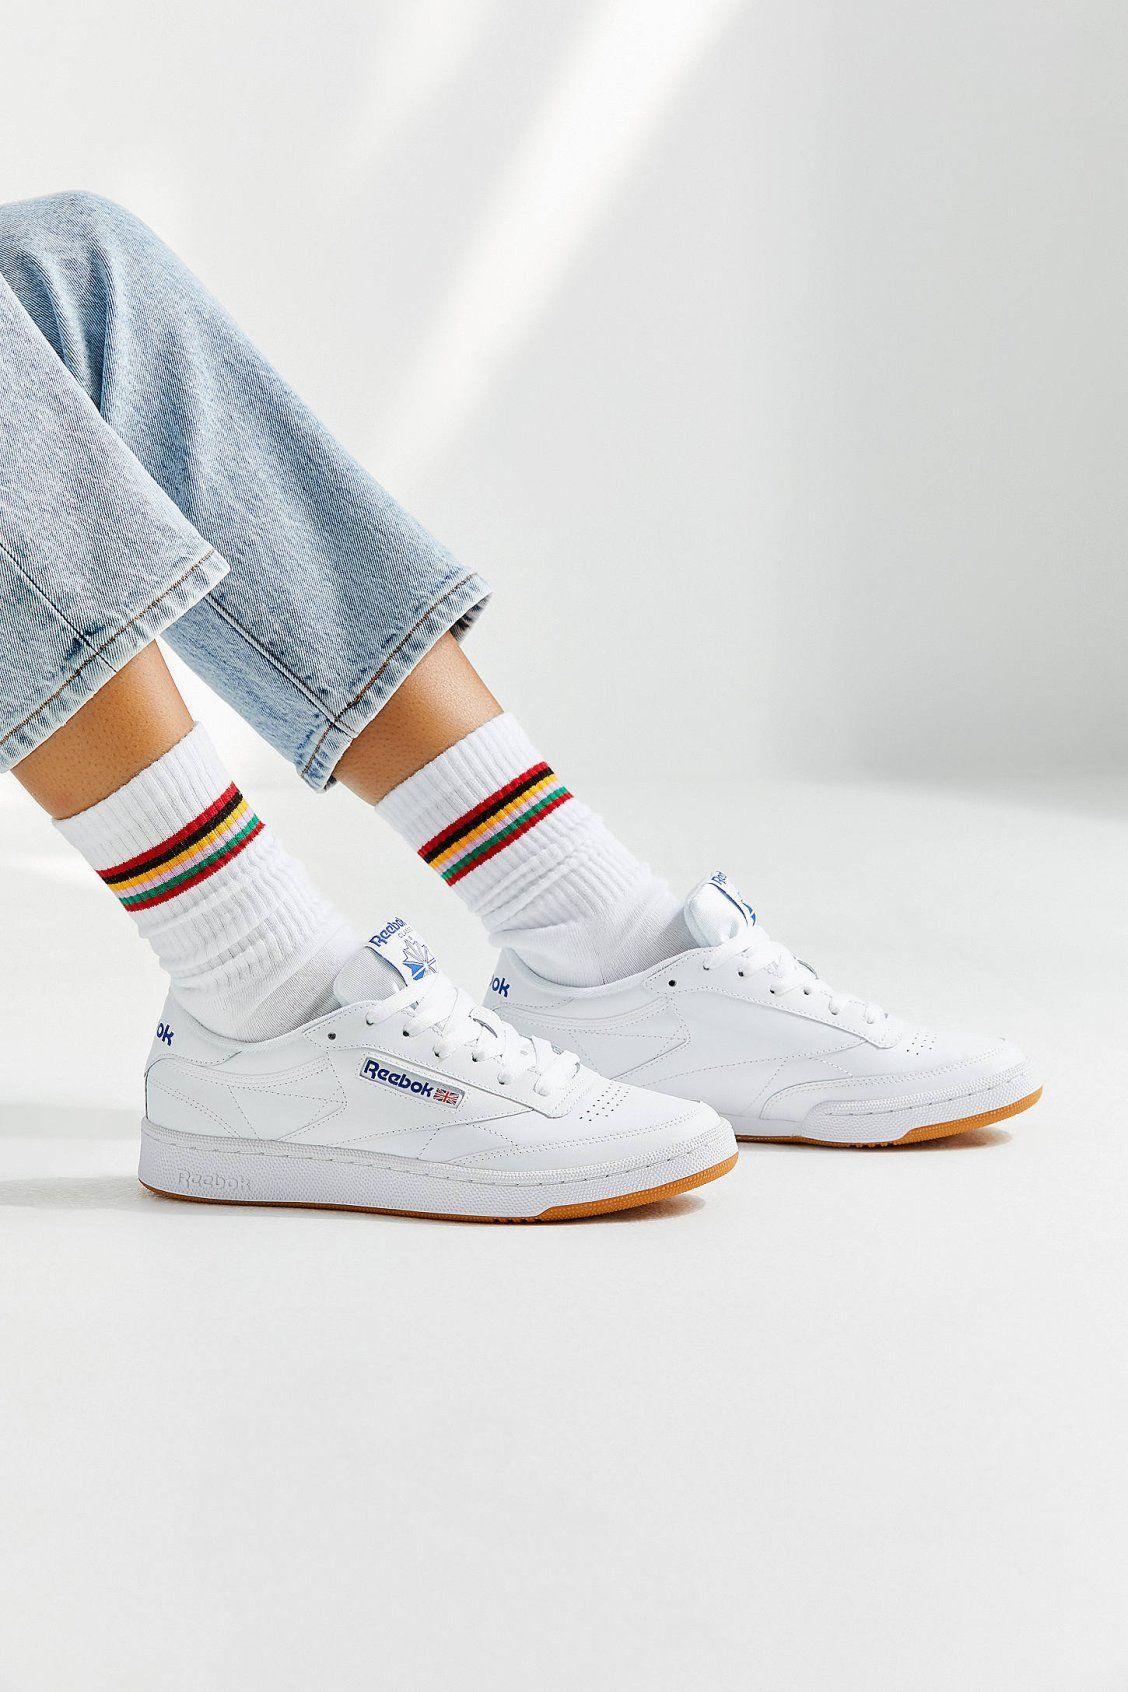 66d59d09c854 Reebok Club C 85 Sneaker